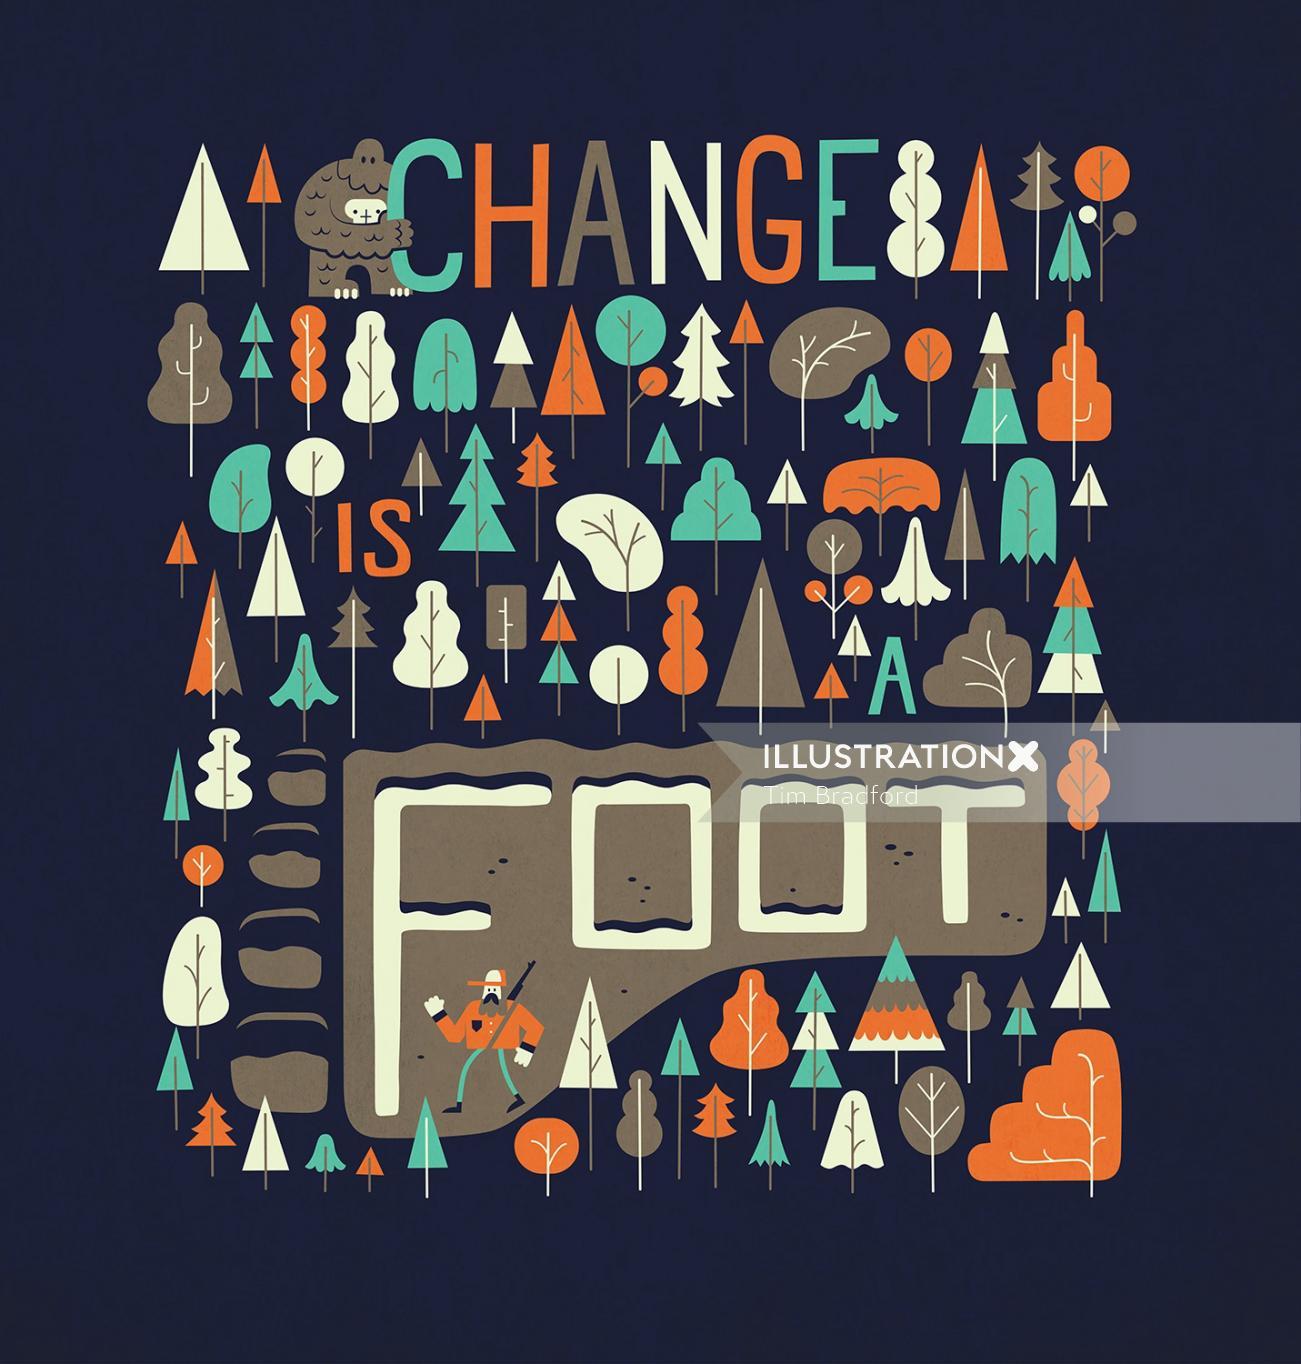 Change is foot nature illustration